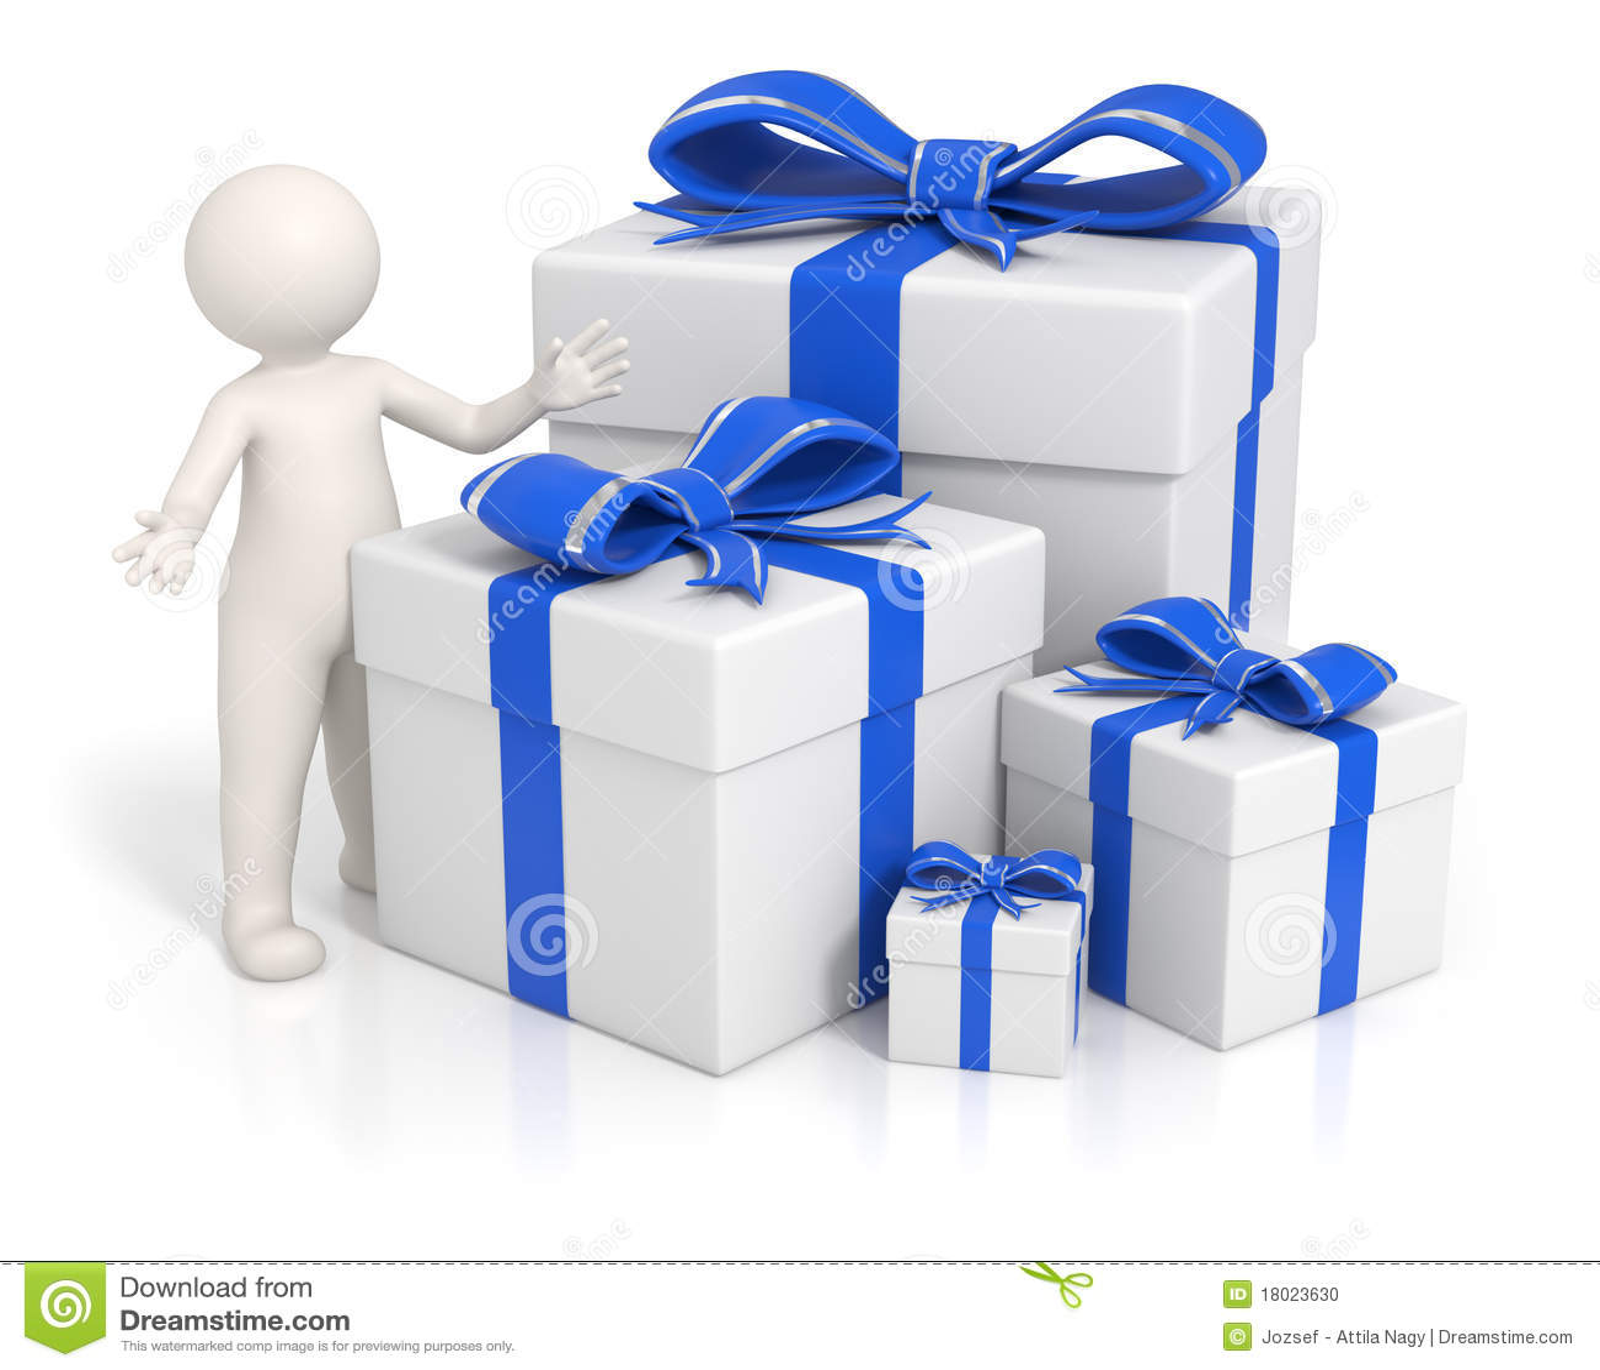 D man blue gift boxes stock illustration